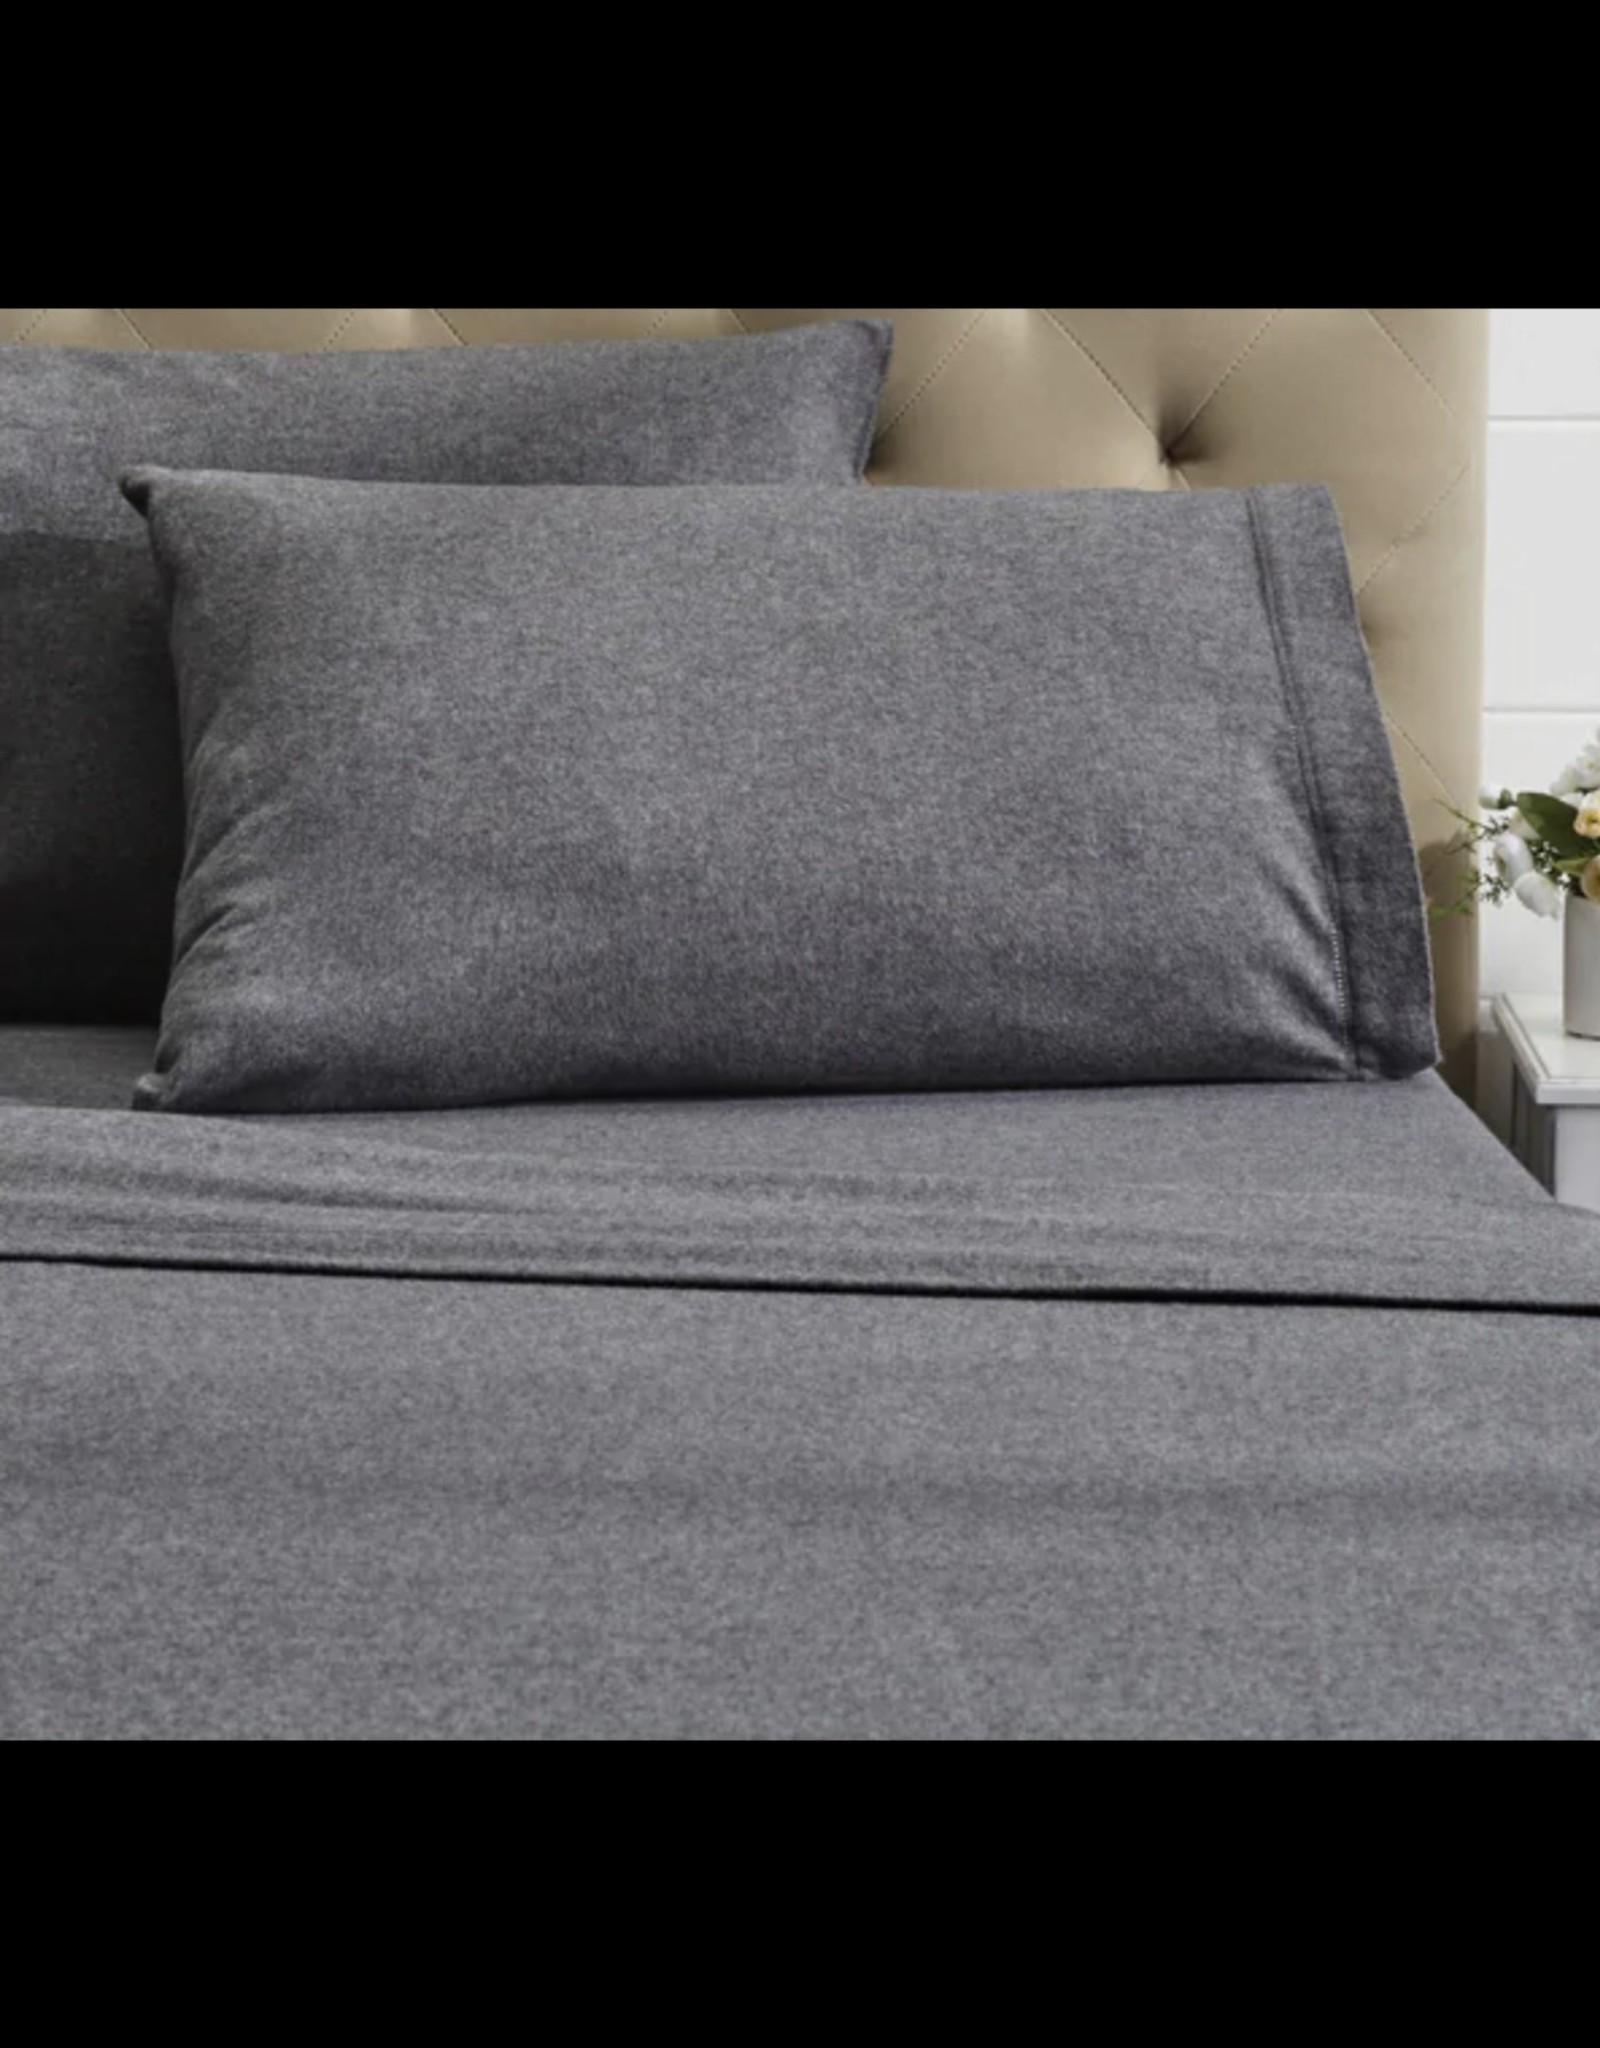 Intermark Sheets Dormisette Flannel King Grey Flat